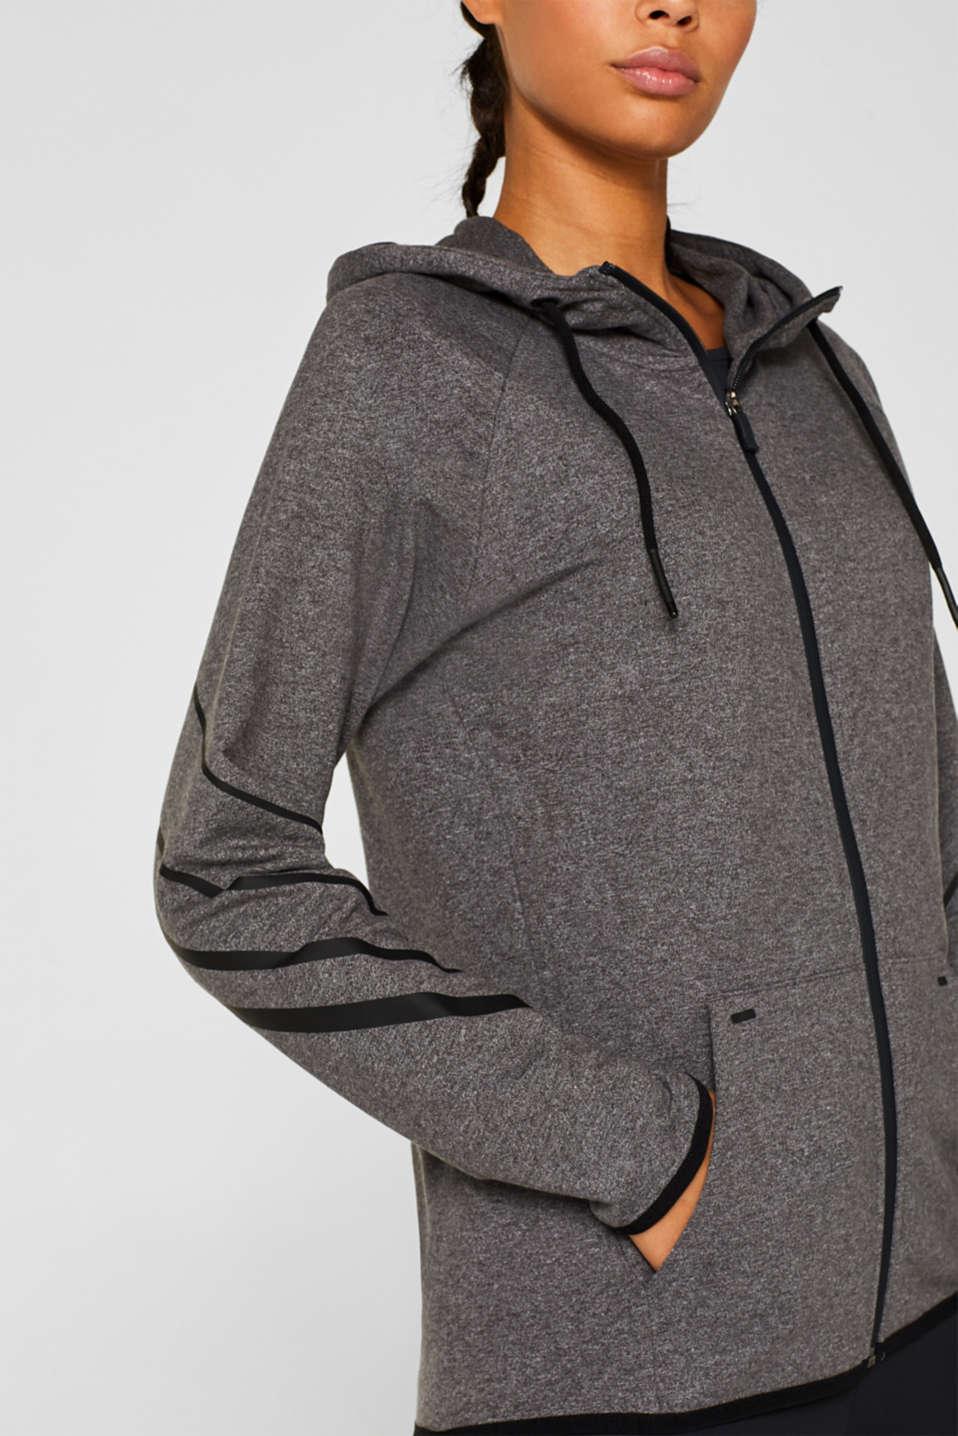 Hooded sweatshirt cardigan, ANTHRACITE 2, detail image number 1